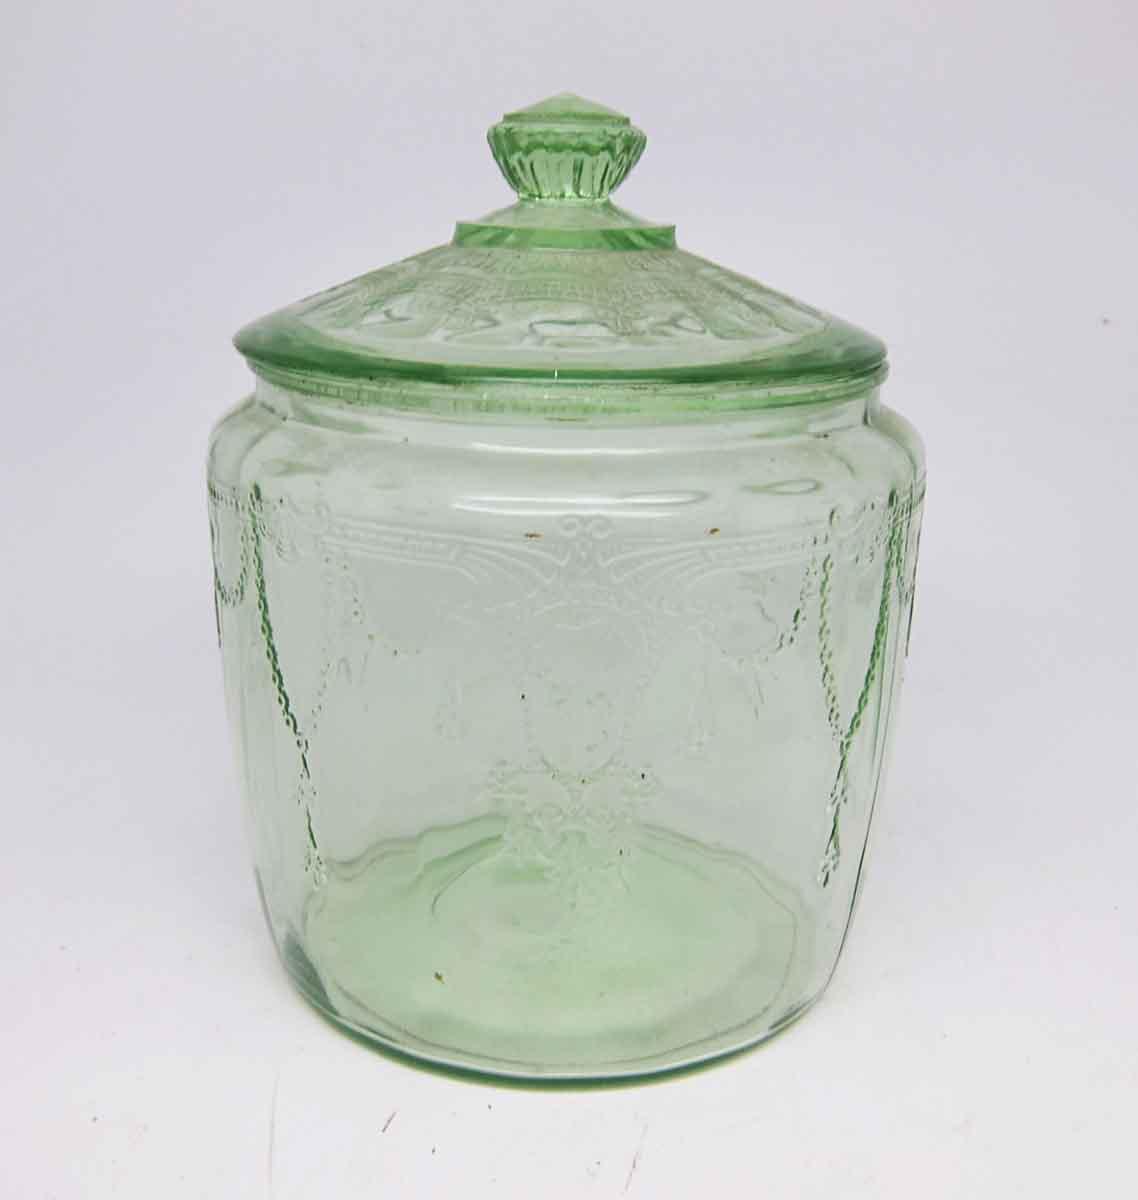 Clear Light Green Vintage Glass Jar With Lid Olde Good